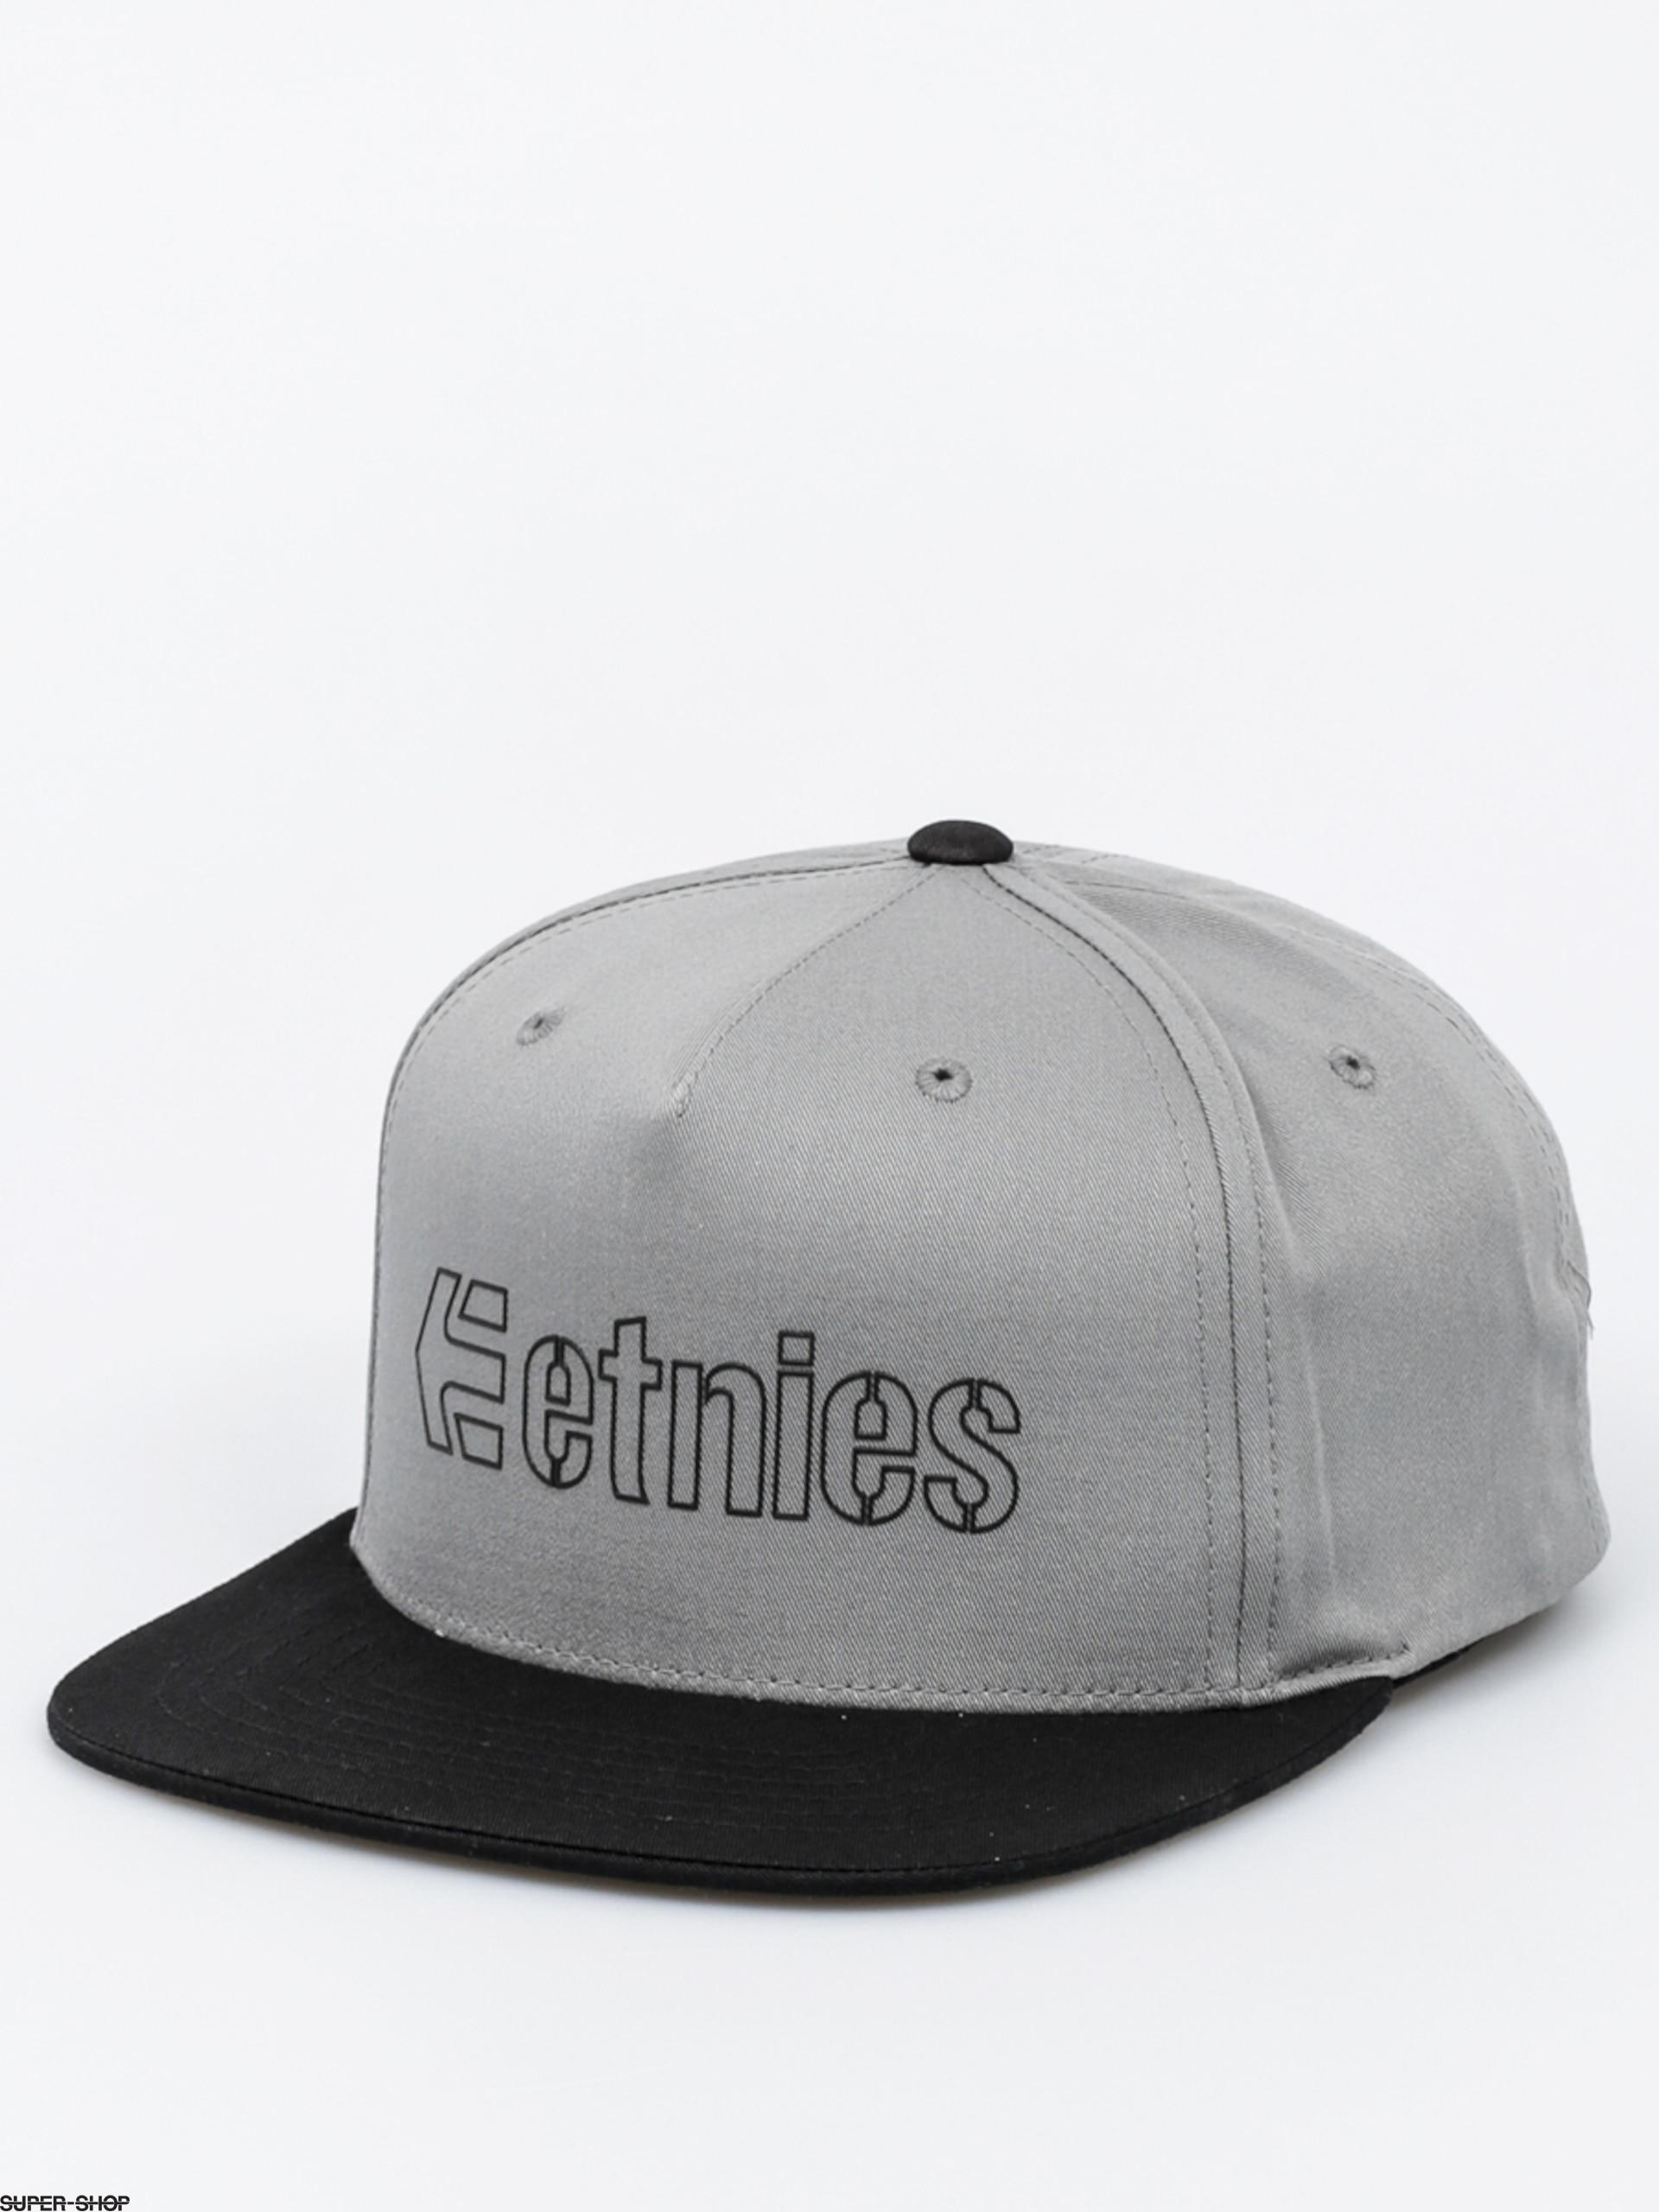 c2d10ac326f 782413-w1920-etnies-cap-corporate-5-snapback-zd-grey-black.jpg